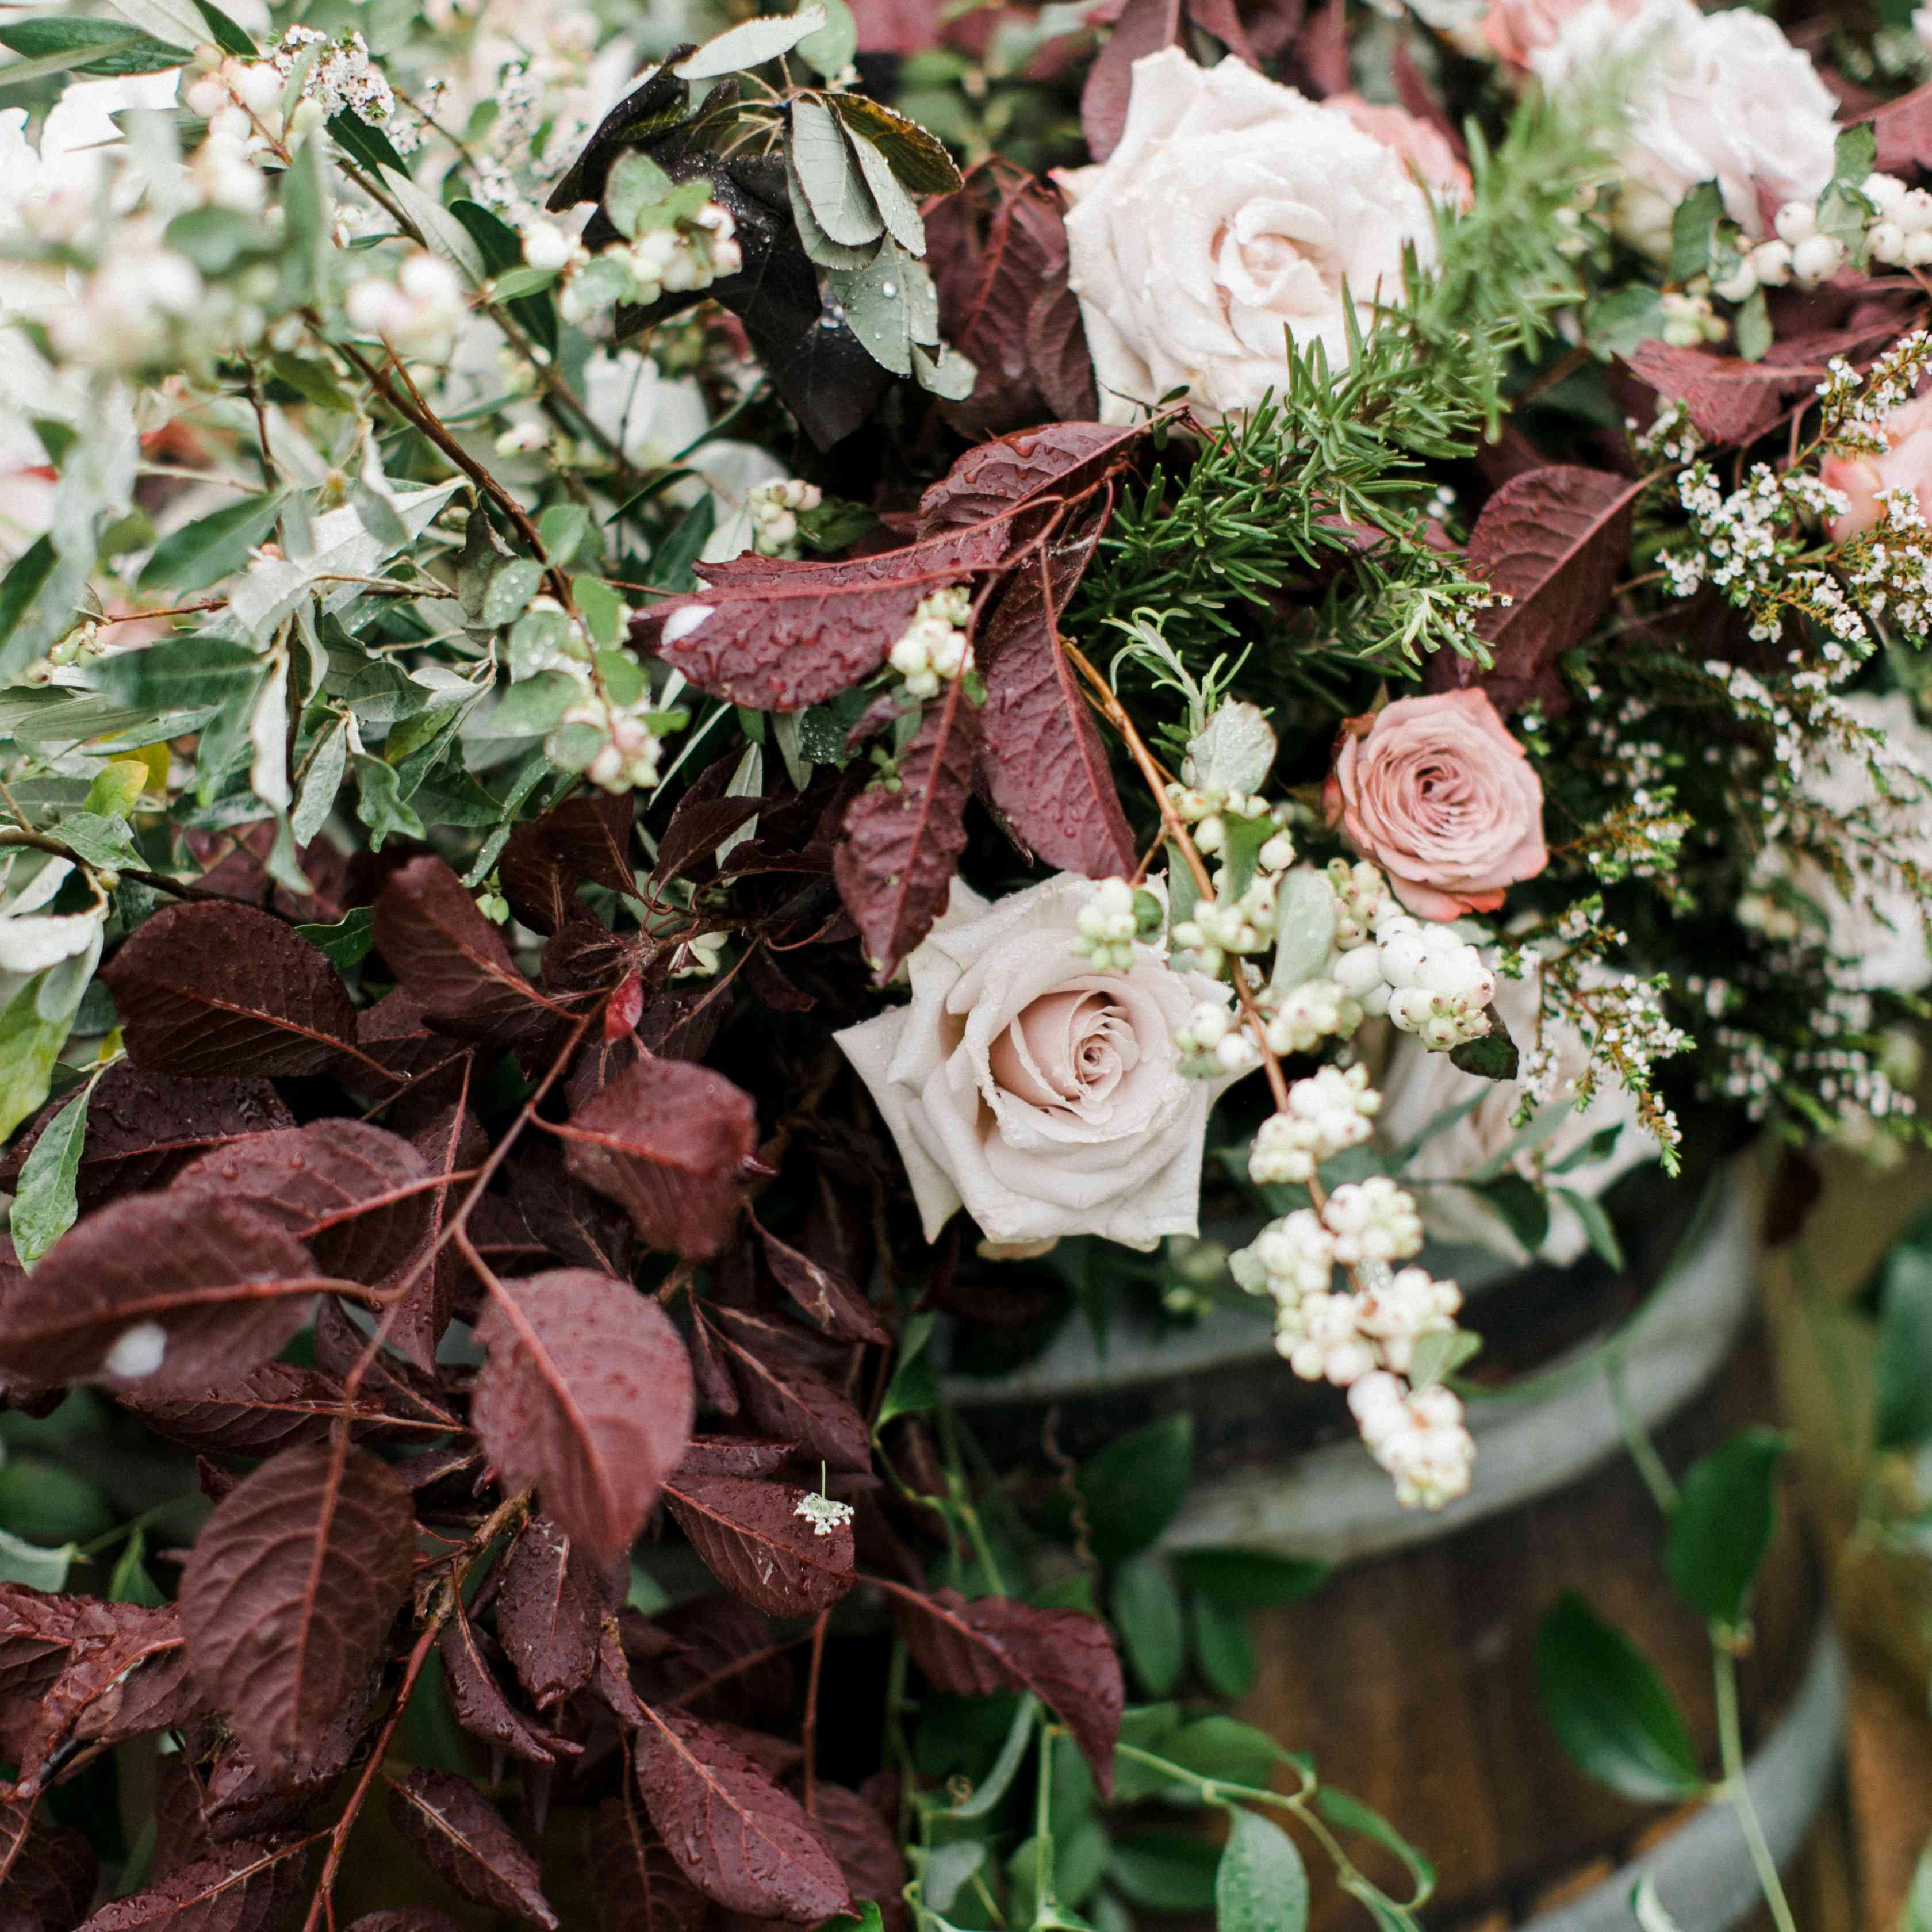 A floral arrangement on a barrel